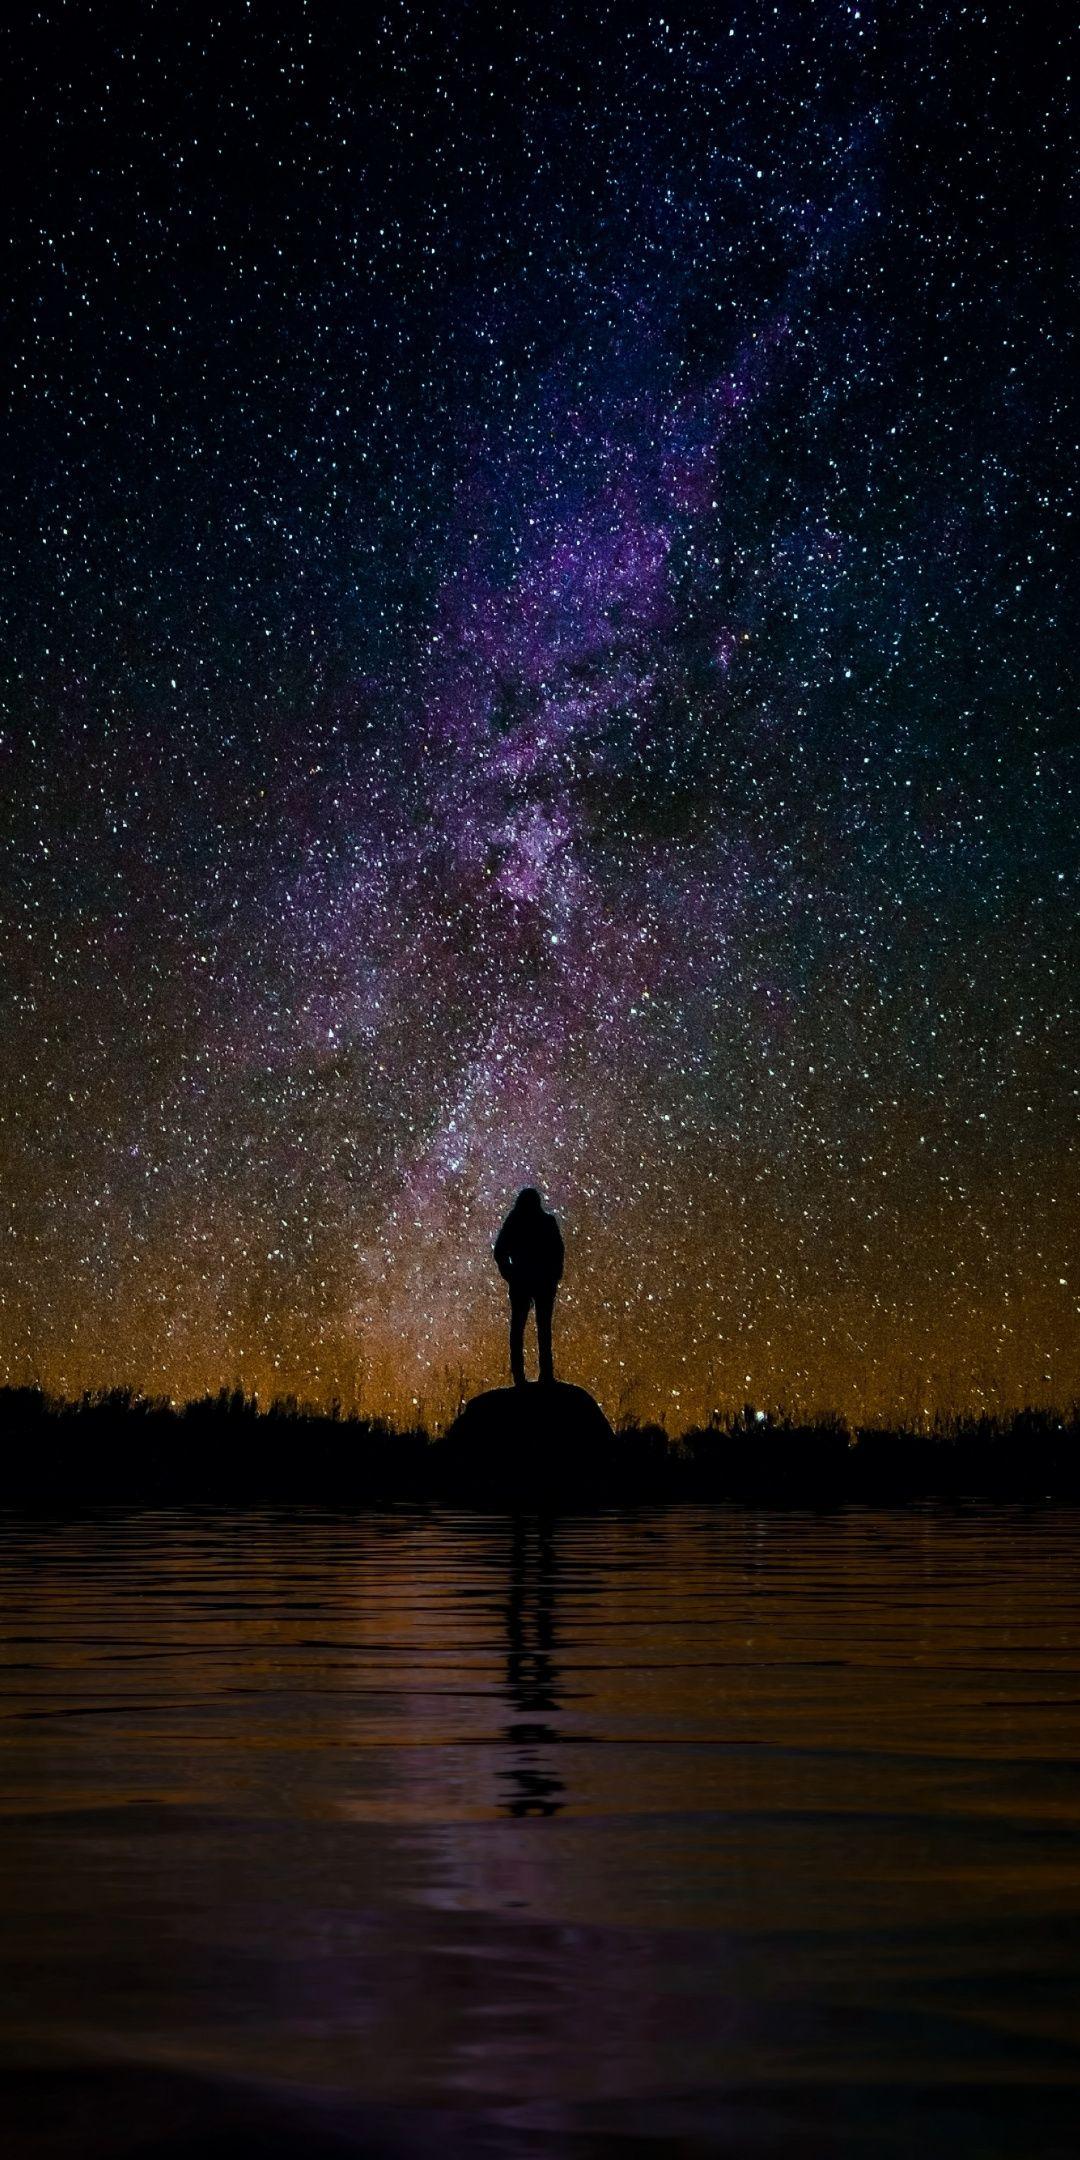 Silhouette Outdoor Man Starry Sky Milky Way Night Wallpaper Starry Night Wallpaper Night Sky Wallpaper Starry Night Sky Starry sky milky way landscape night